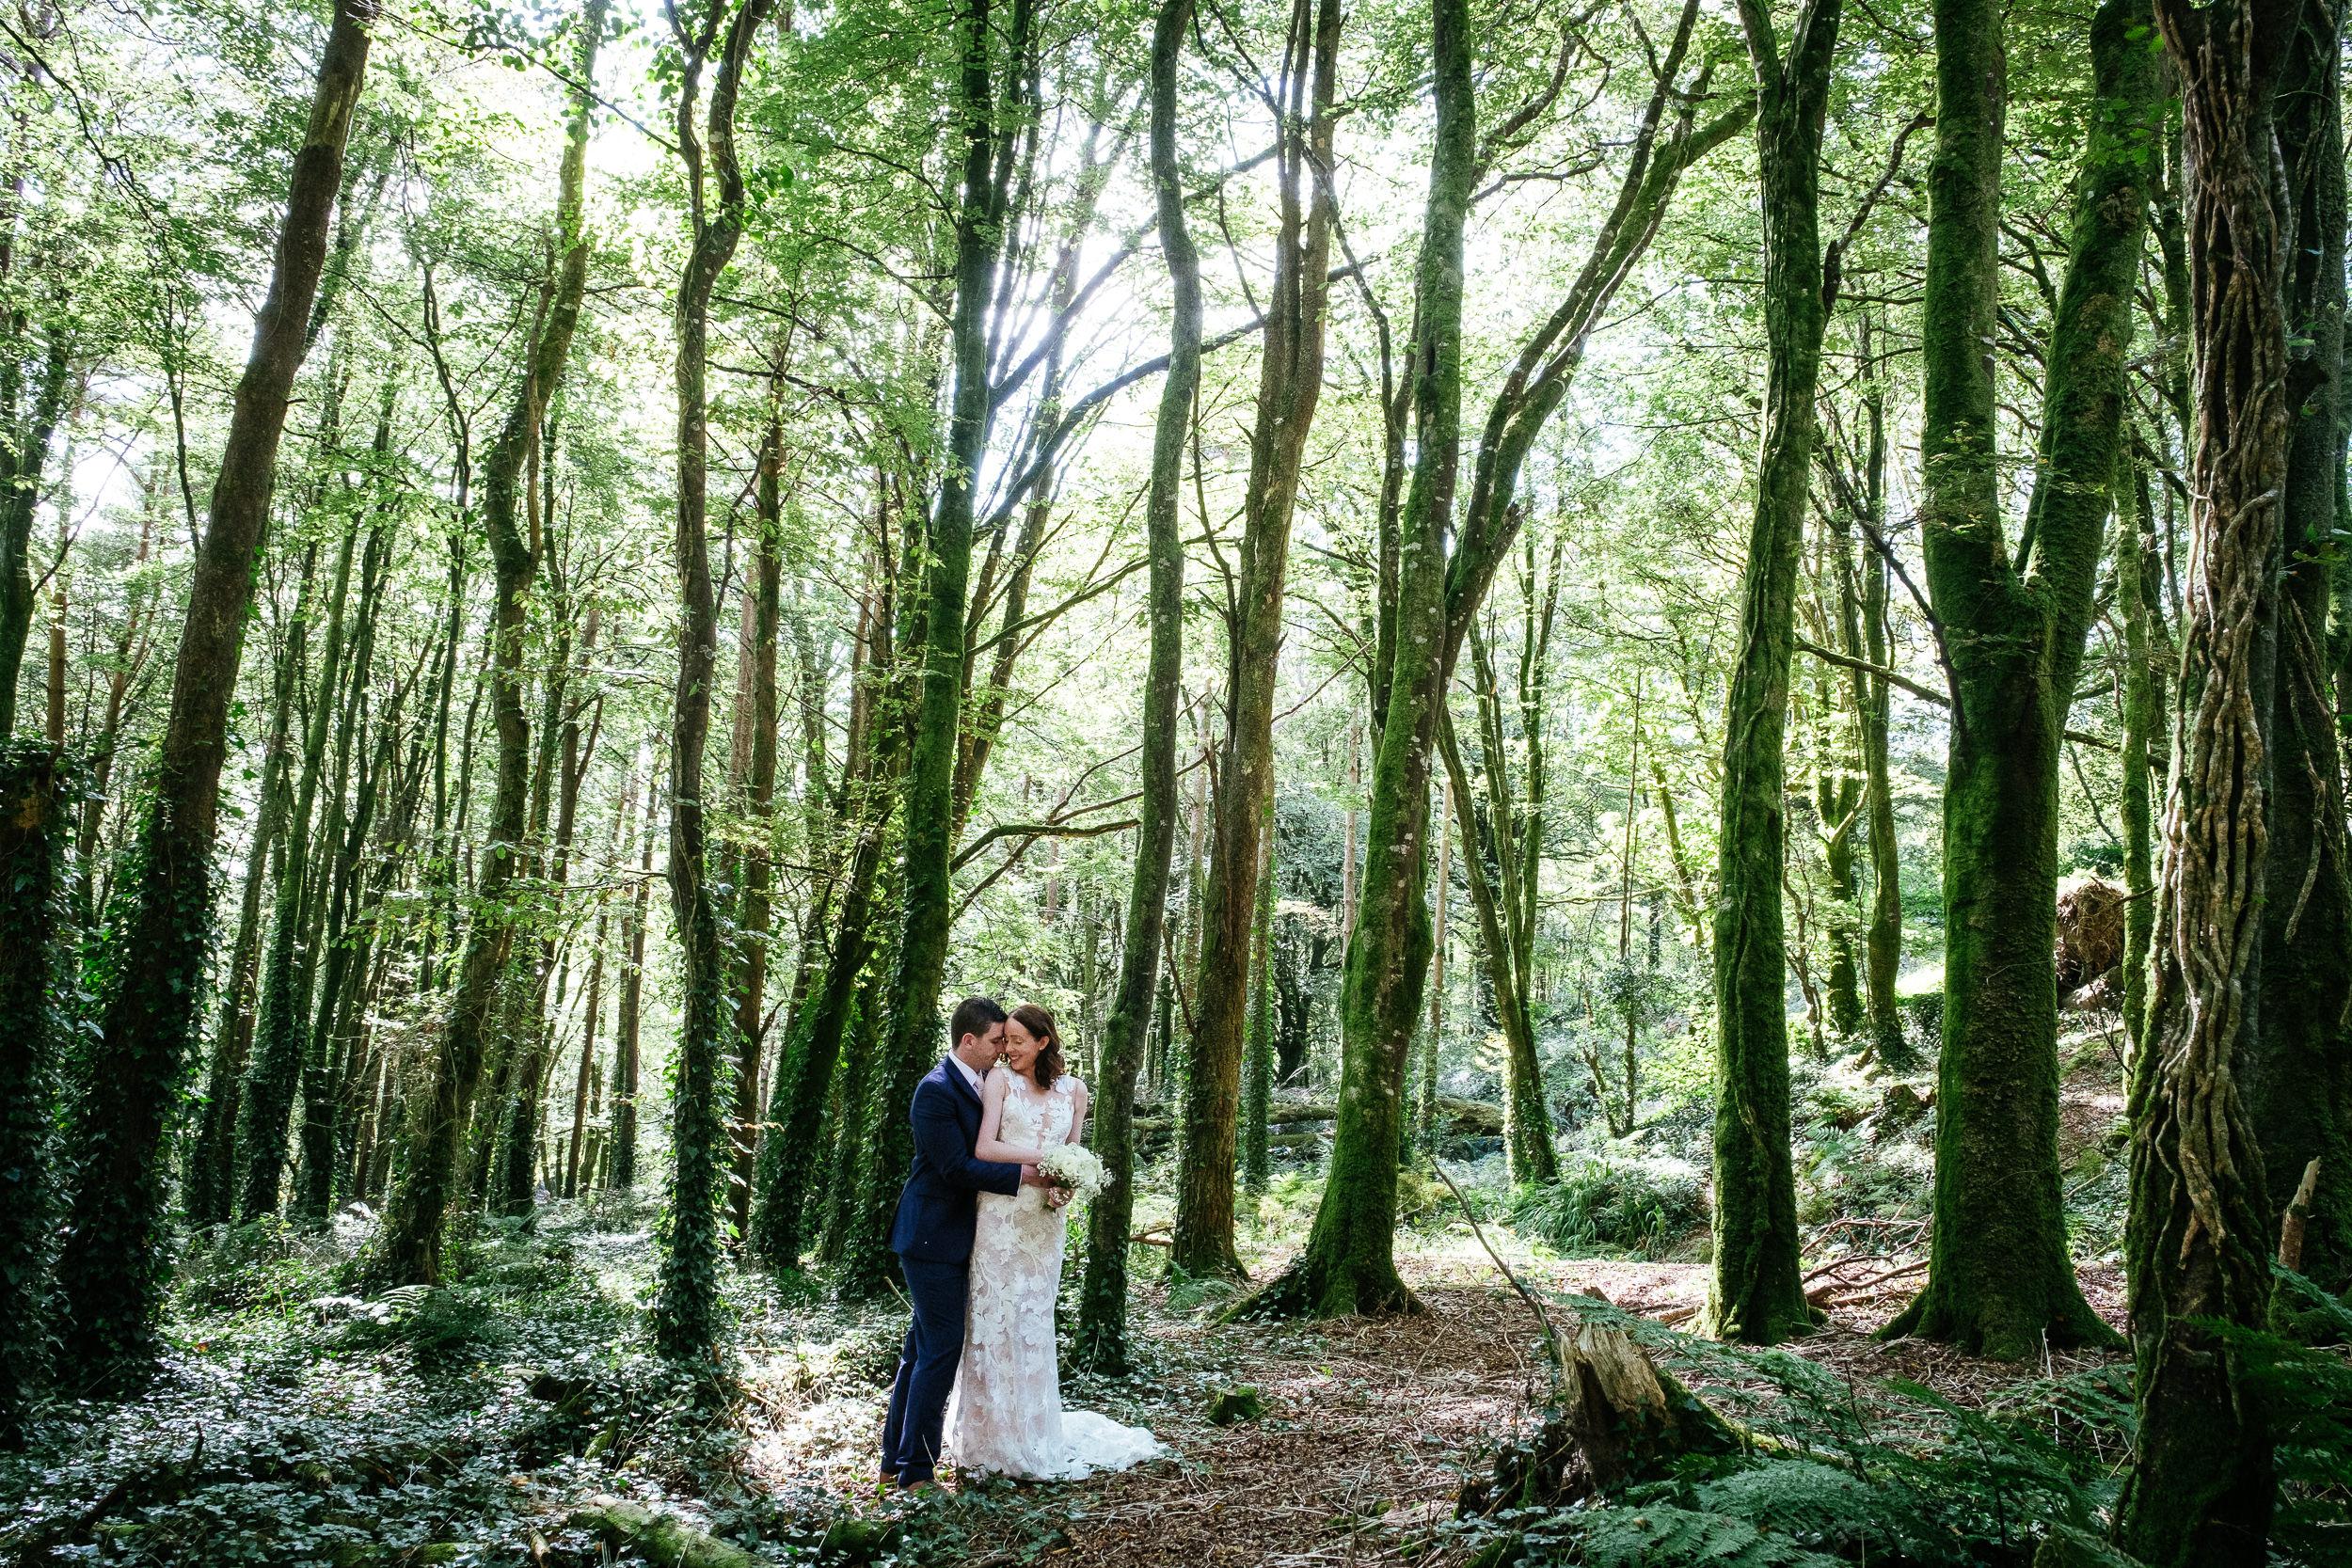 Dunmore House Hotel Clonakilty Cork Wedding Photographer 67